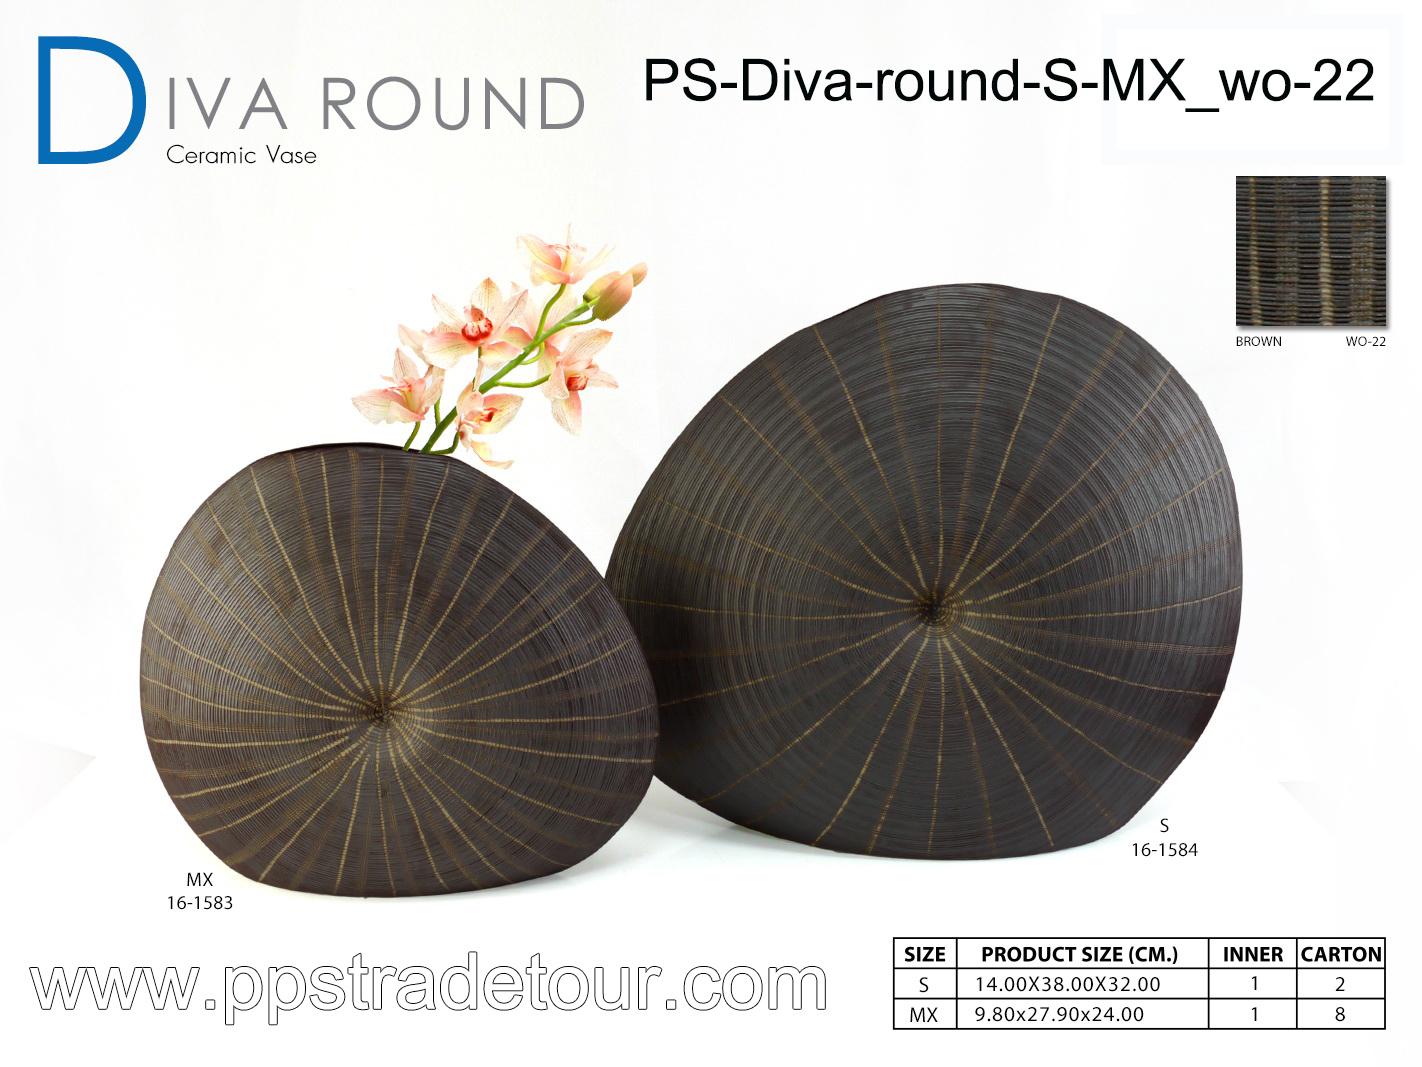 PSCV-Diva-round-S-MX_wo-22